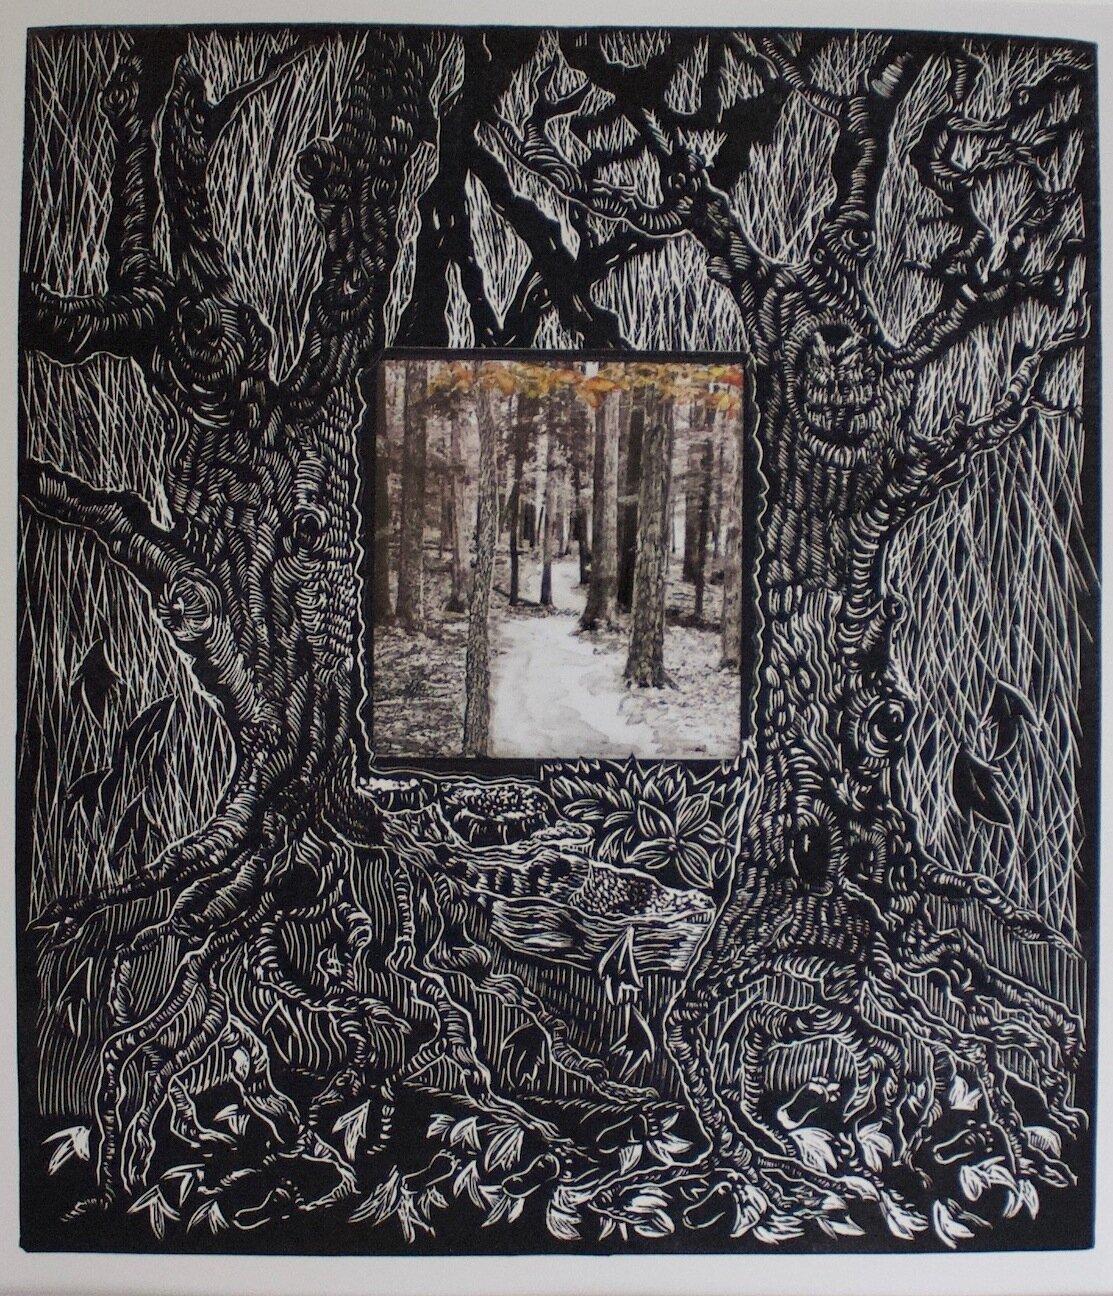 """Untitled"" by Debby Stratford, printmaking, 16x30in, linoprint, $175.00"